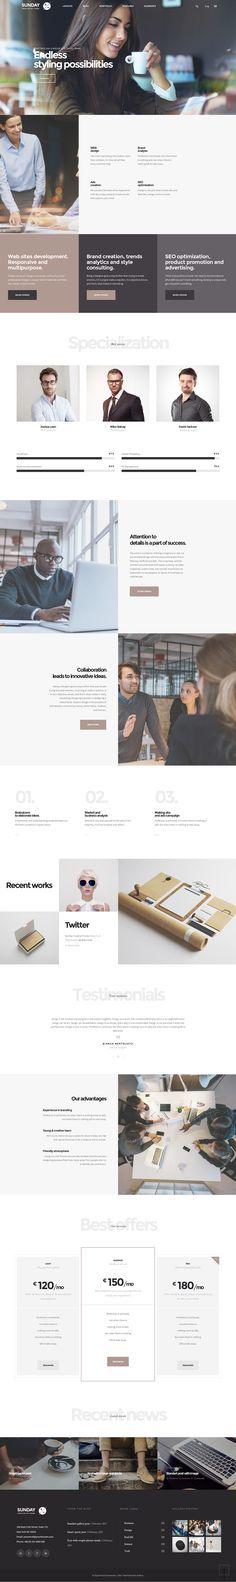 Clean & Simple WordPress Themes #2015